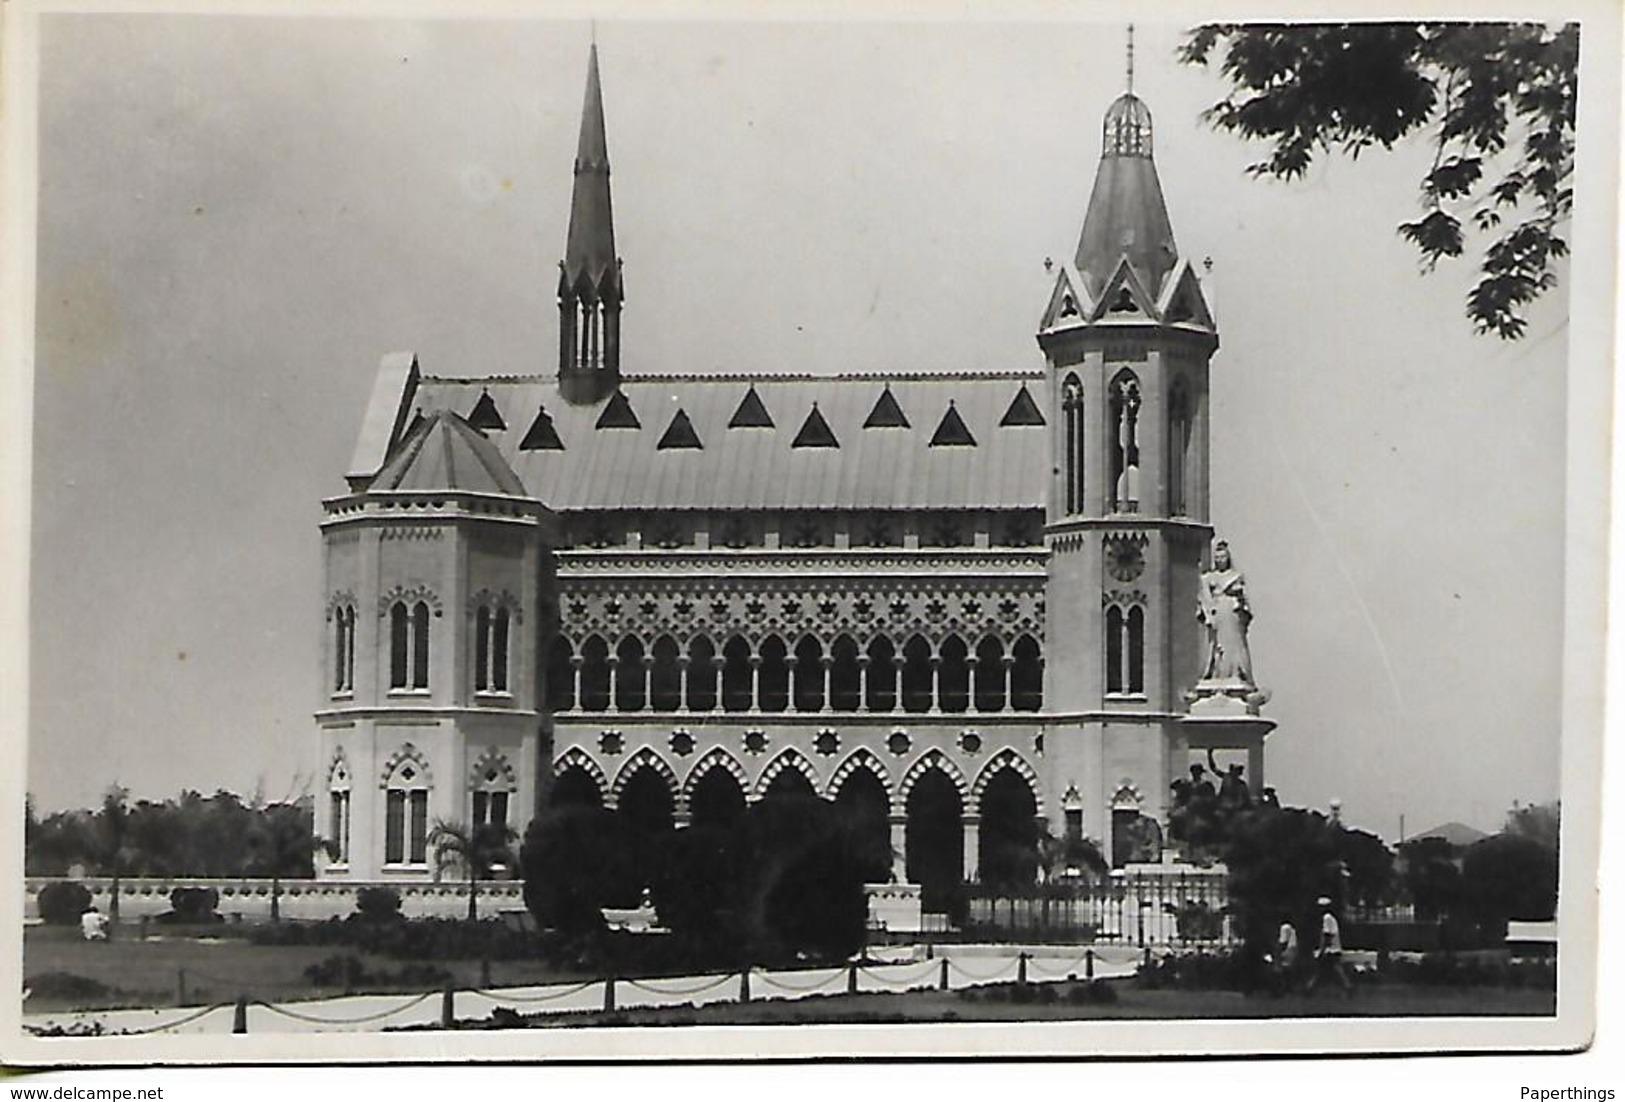 Old Real Photo Postcard, Pakistan, Karachi, Large Building, Temple, Hall, Landscape. - Pakistan